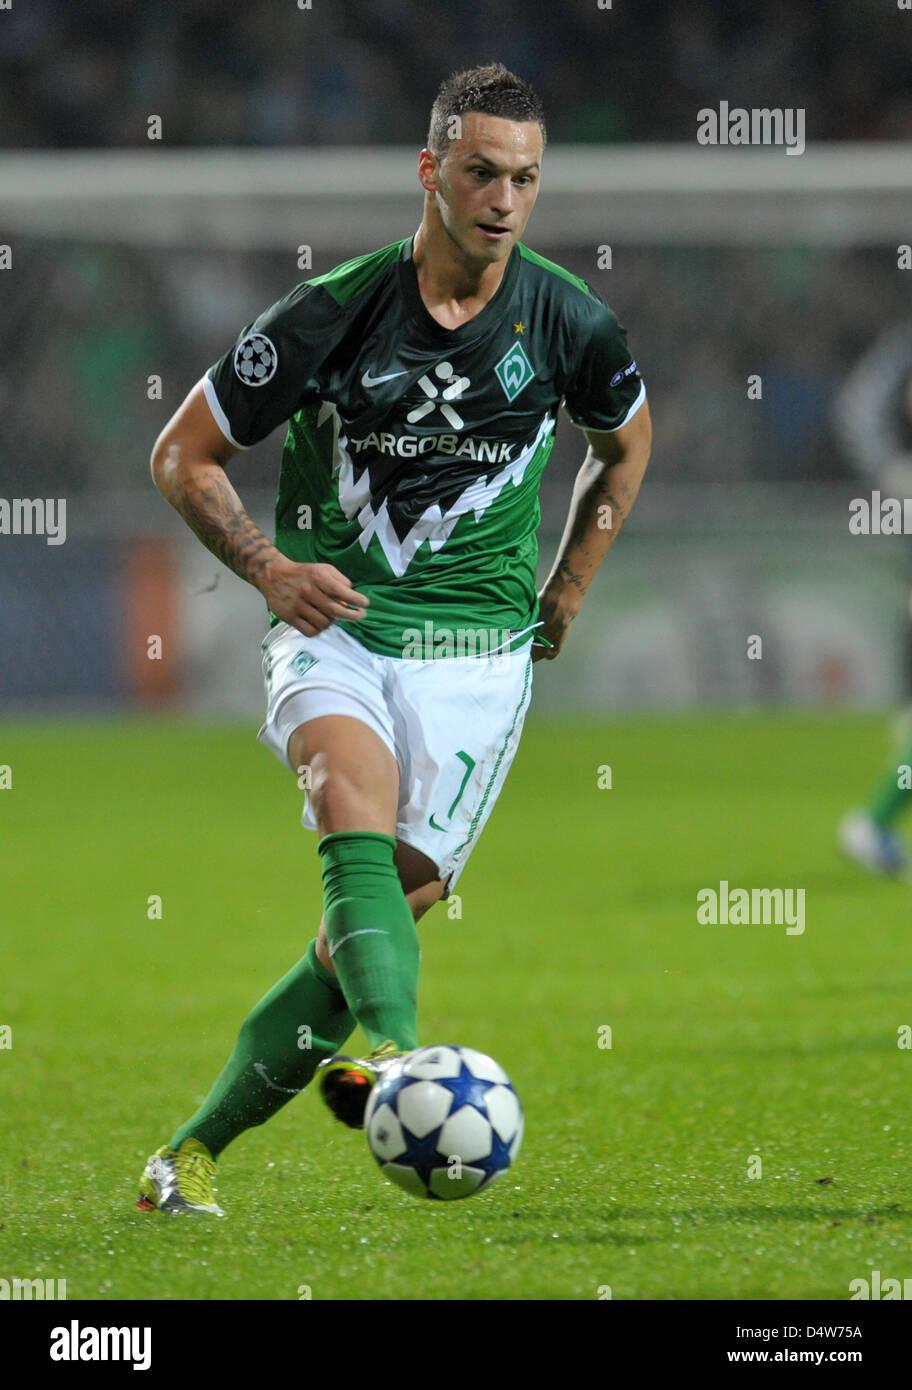 Fu§ball, Champions League, Gruppe A, 1. Spieltag: SV Werder Bremen - Tottenham Hotspur am Dienstag (14.09.2010) - Stock Image